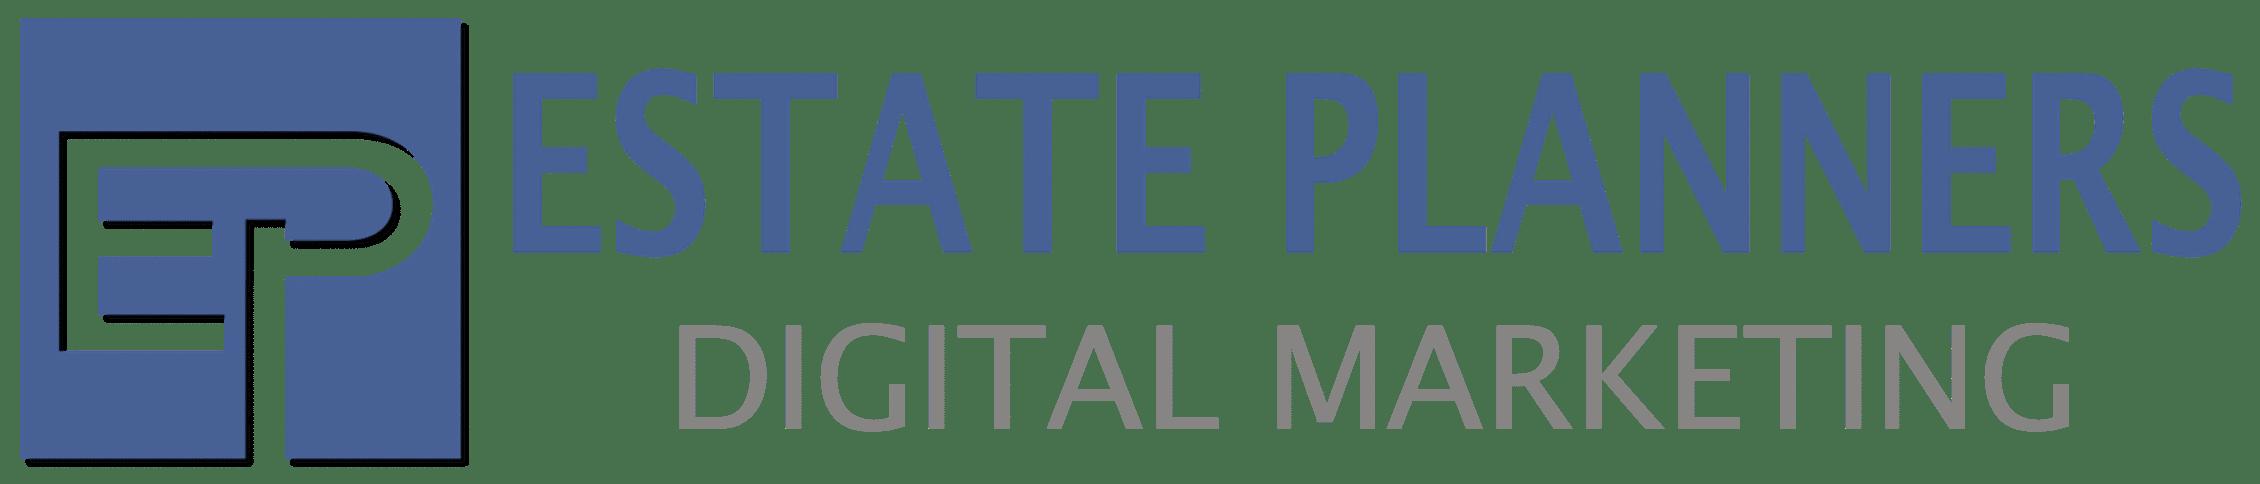 Estate Planners Digital Marketing | Call 1-800-595-1801